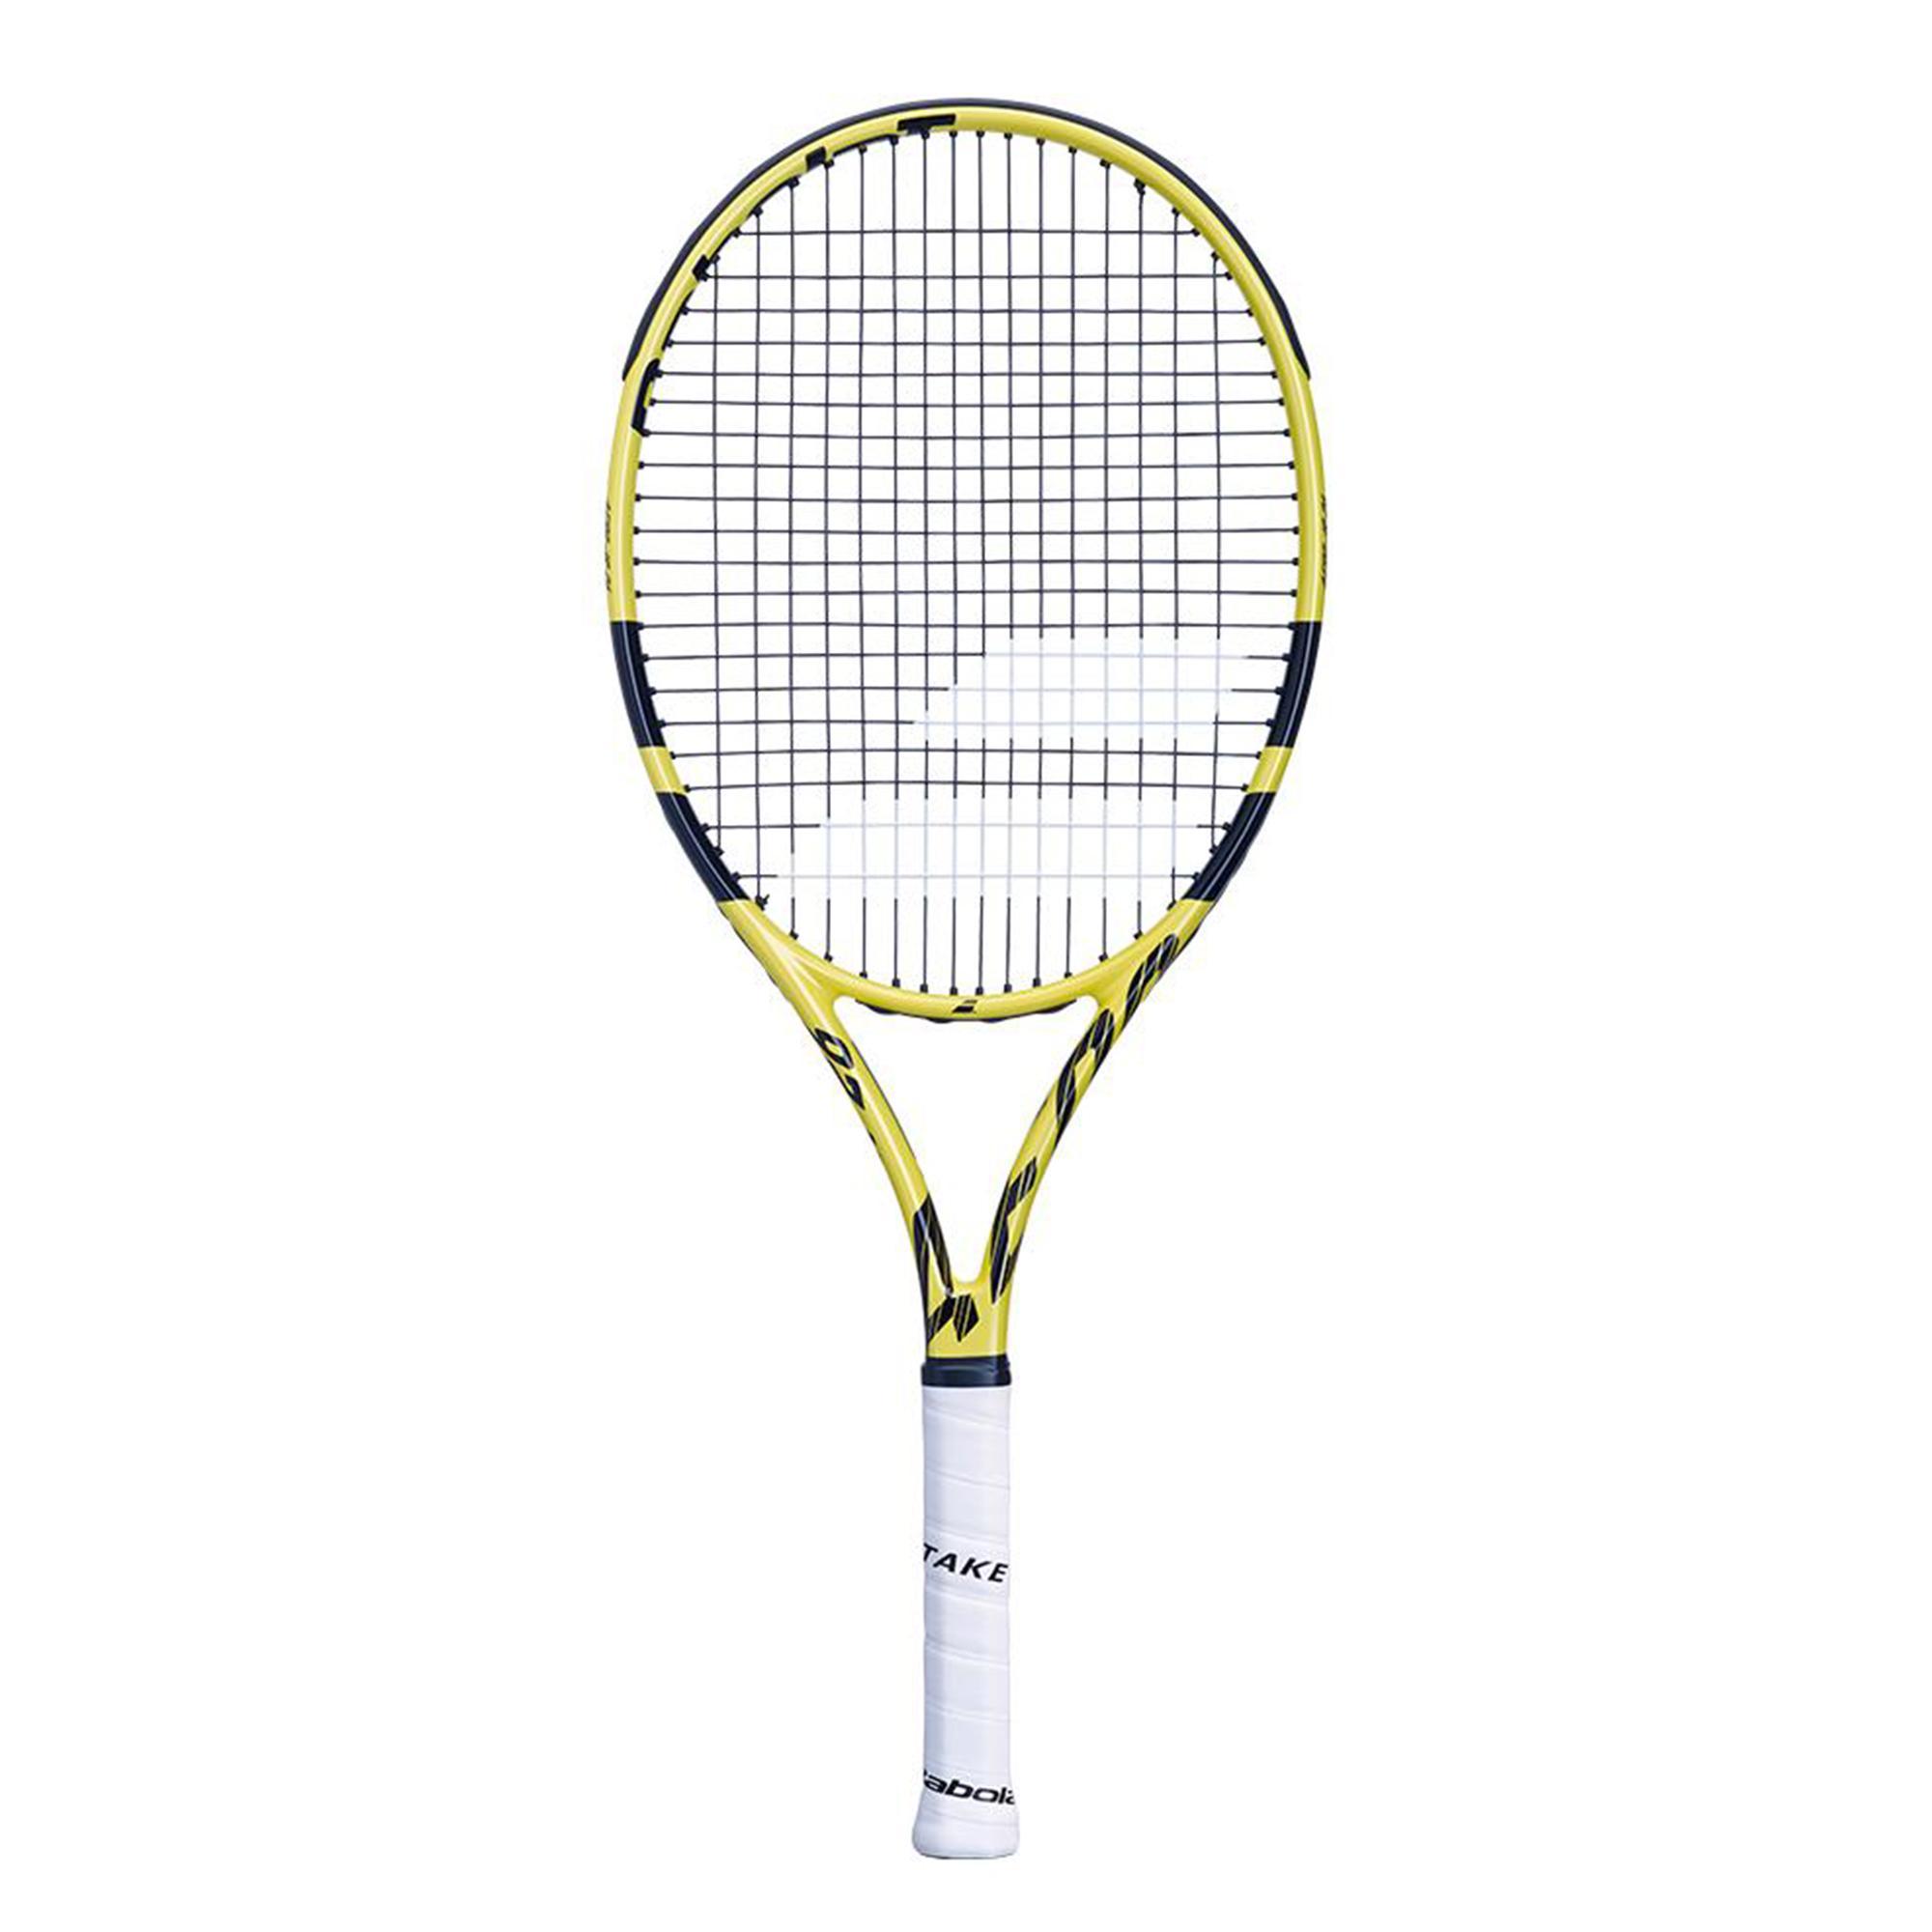 e4e187f4577fd8 Babolat Philippines: Babolat price list - Tennis Racket, Sneaker ...